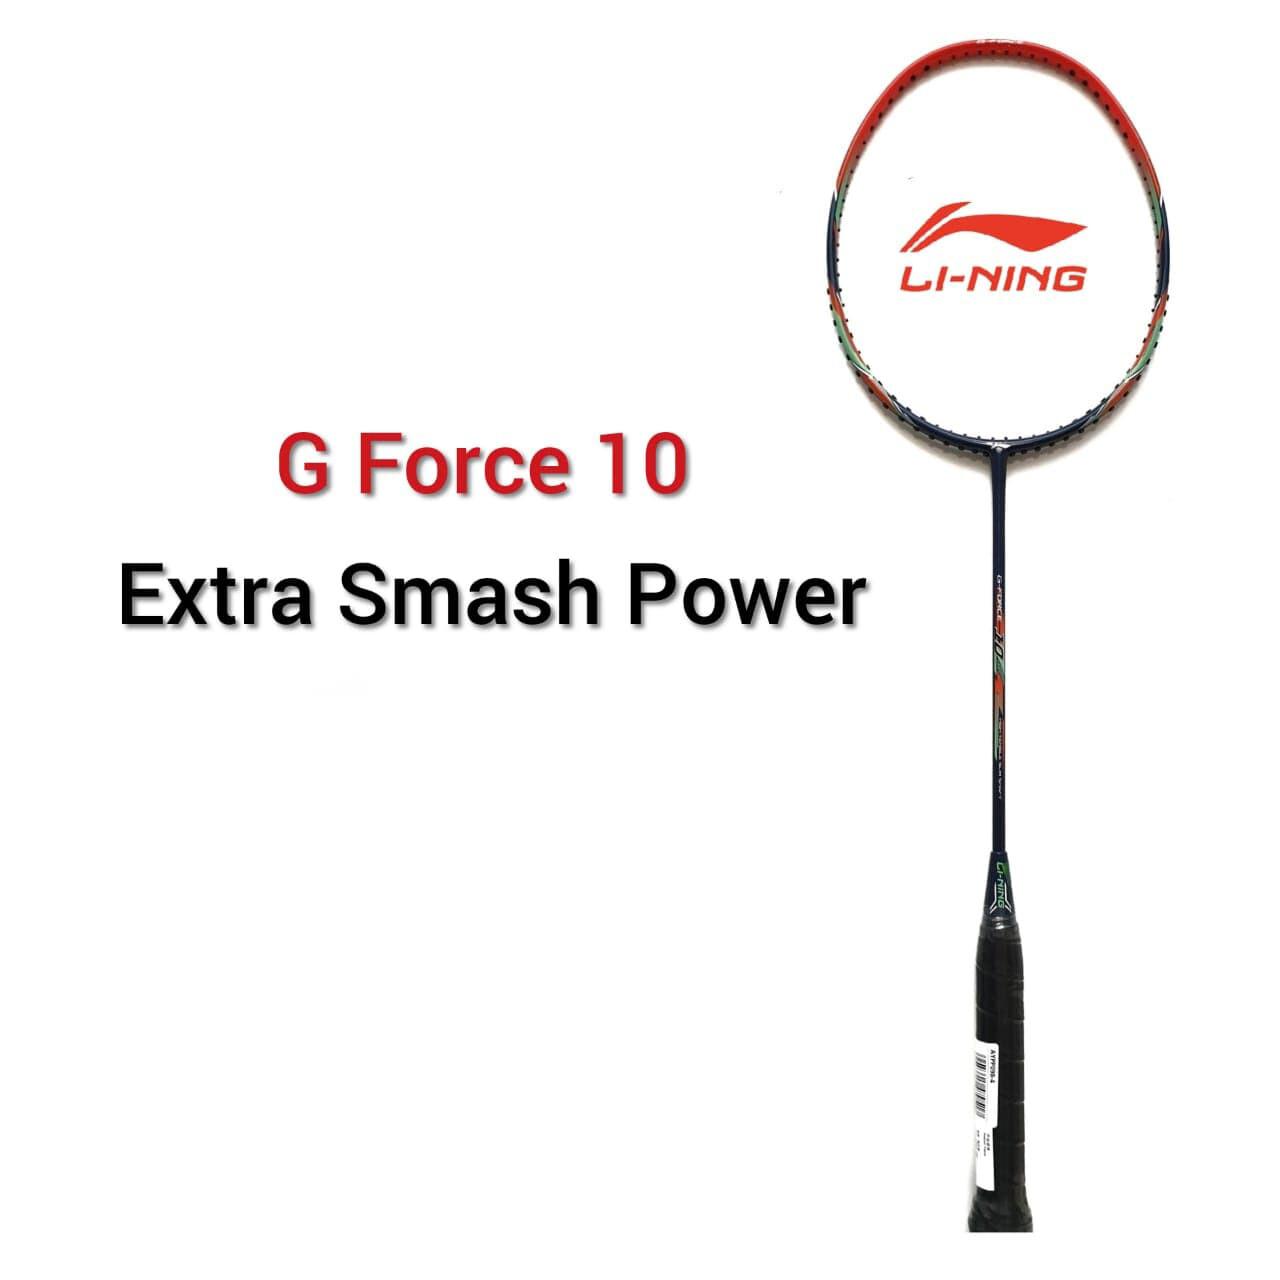 LI-NING G-Force 10 Badminton Racquet-